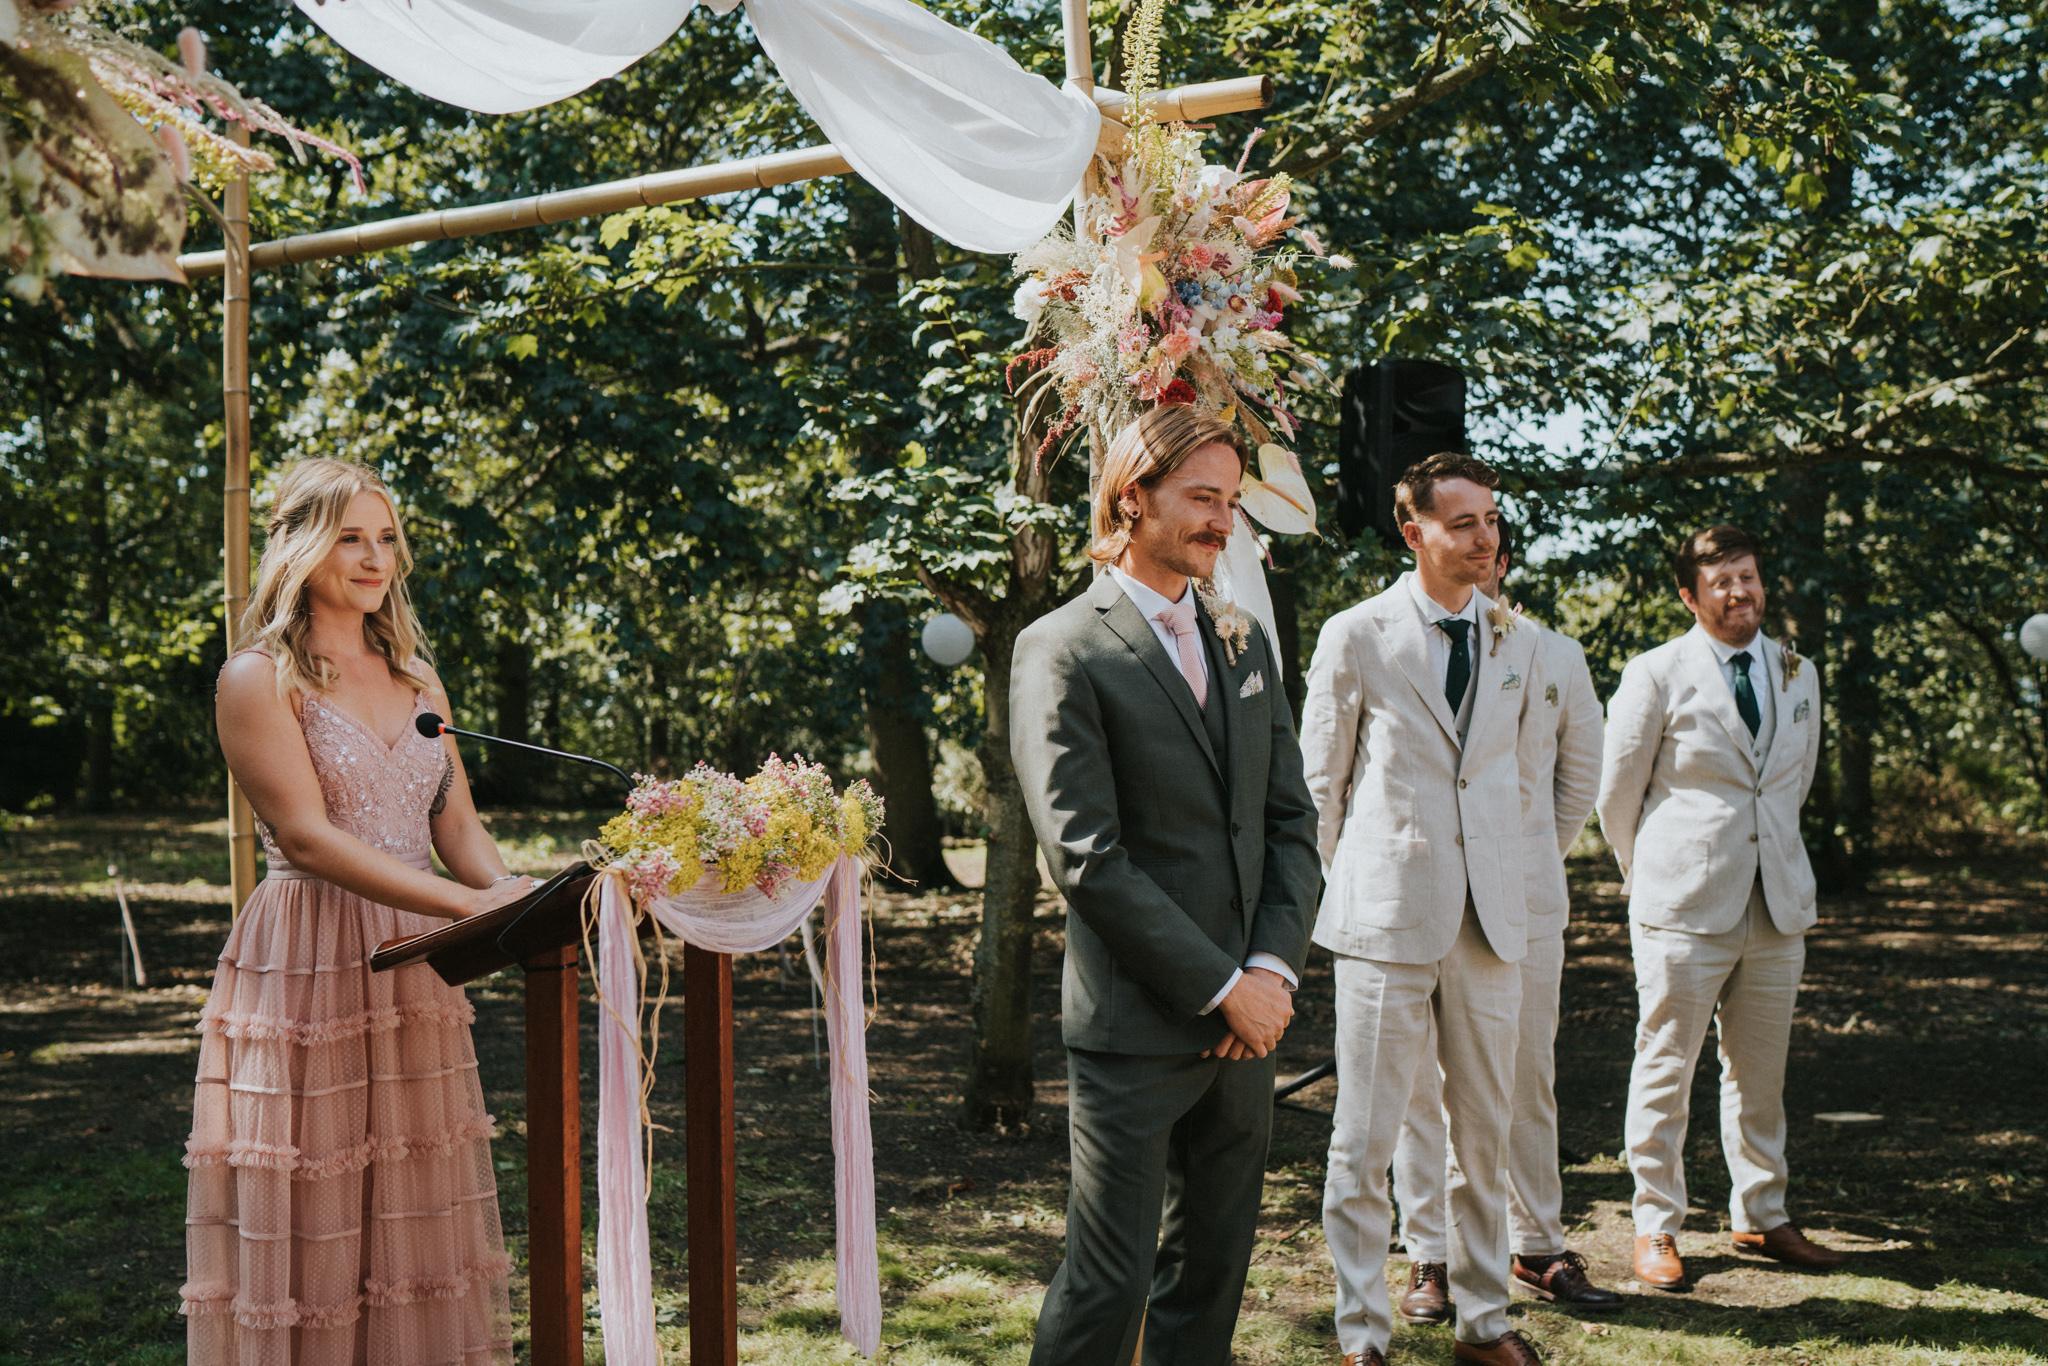 emi-Jack-boho-diy-wedding-eggington-house-grace-elizabeth-colchester-essex-alternative-wedding-photographer-suffolk-norfolk-devon (11 of 56).jpg